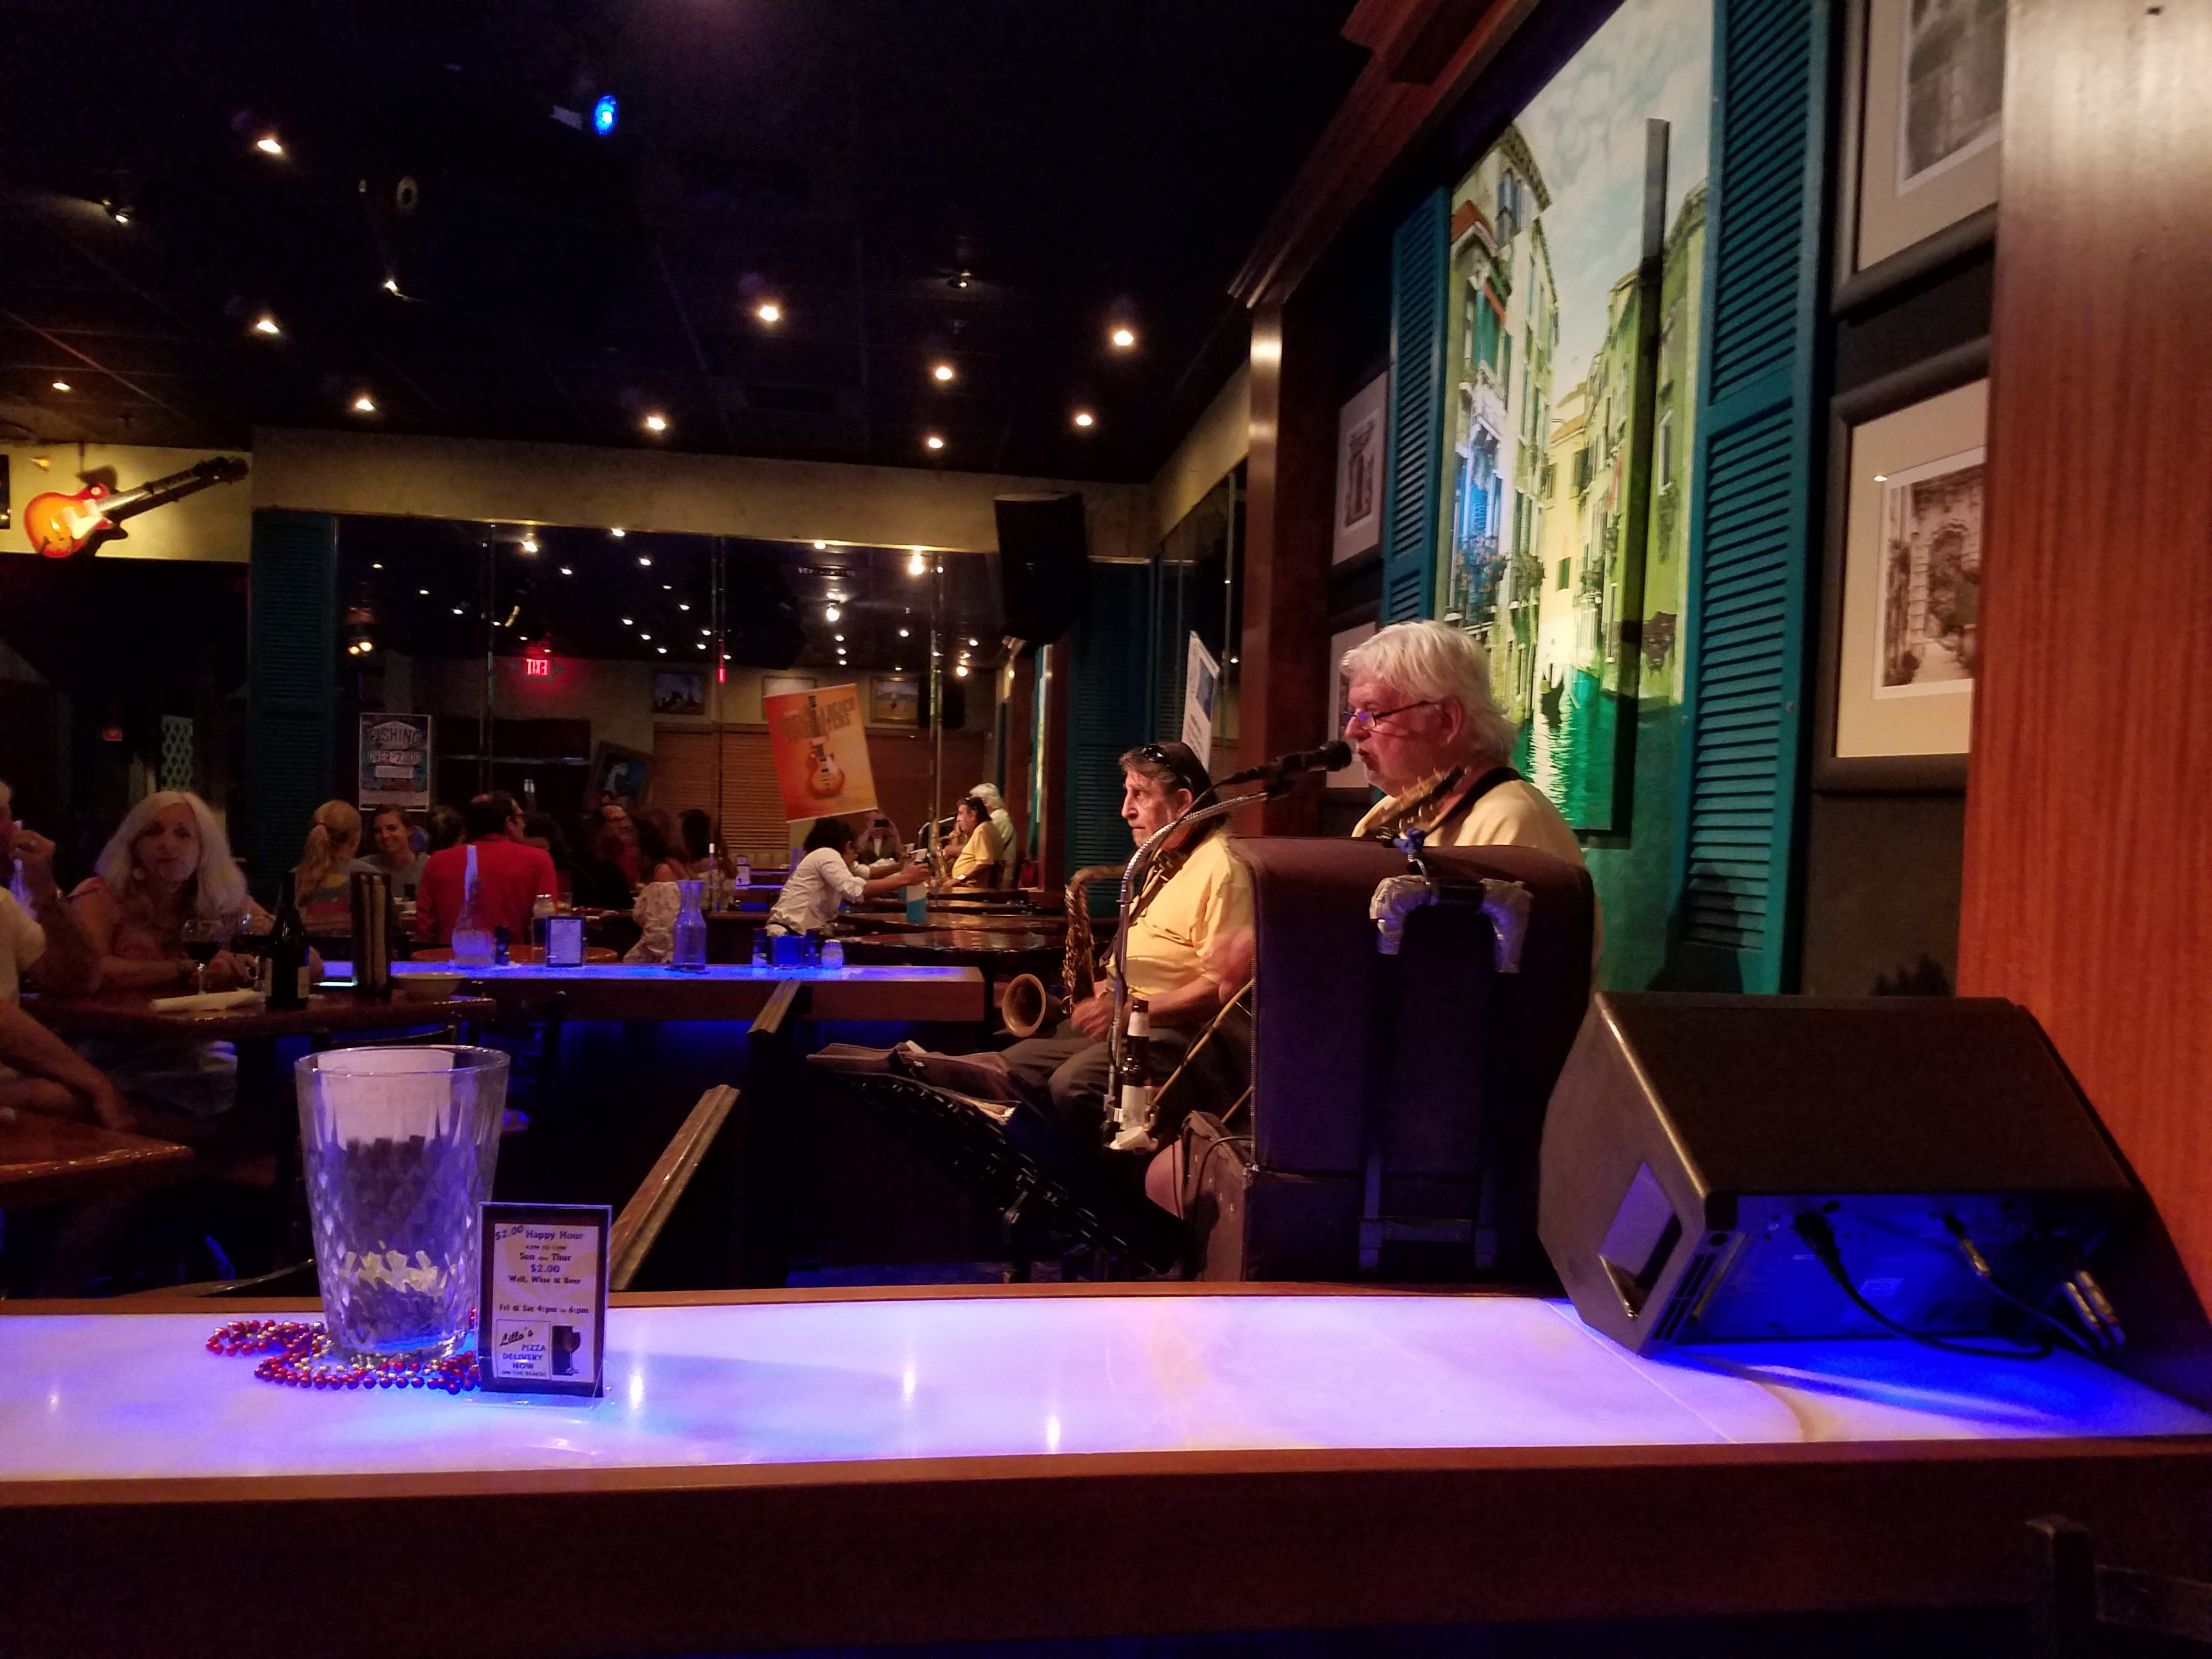 Two jazz musicians at Lillo's at Pensacola Beach.